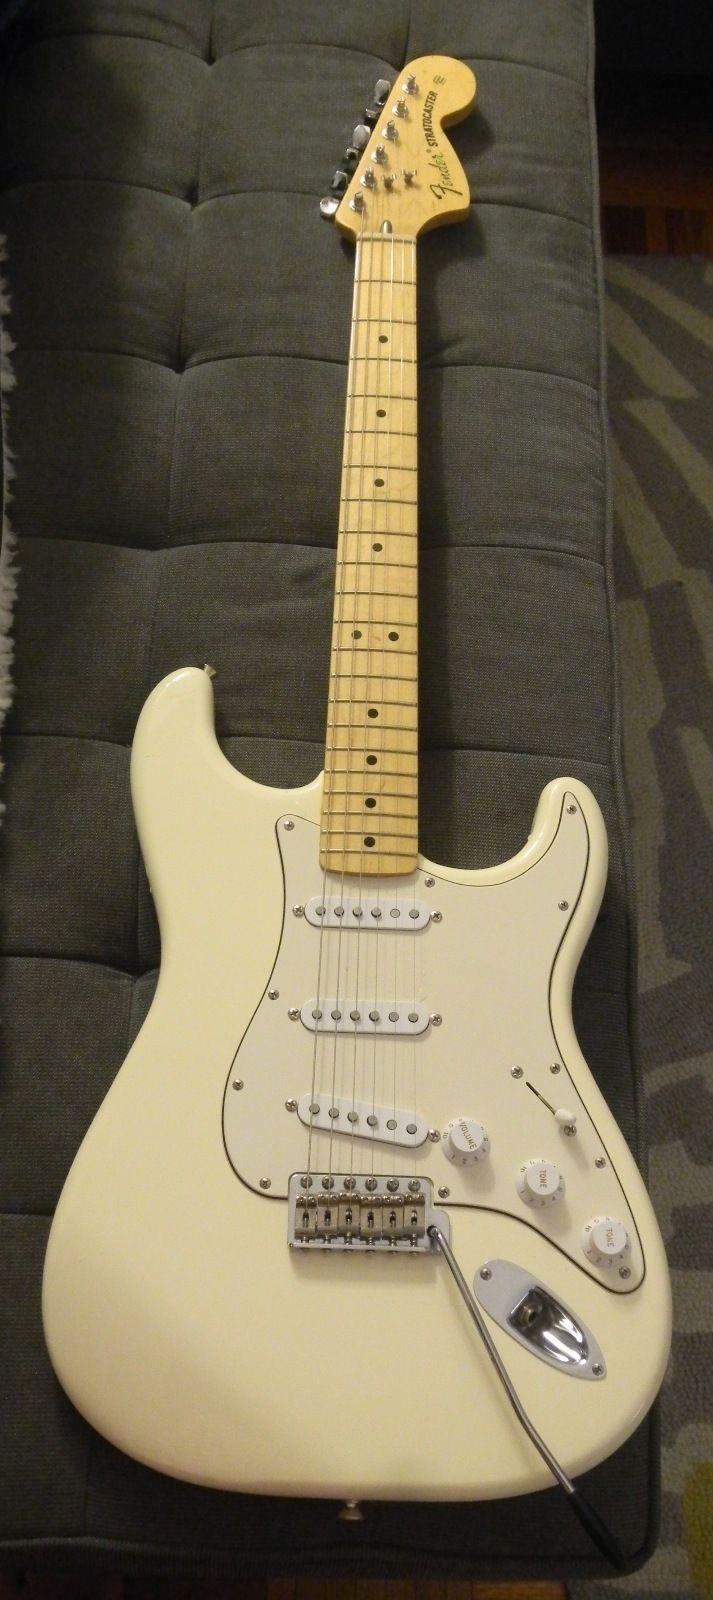 fender 70 39 s stratocaster electric guitar guitar collectibles music guitar guitar chords. Black Bedroom Furniture Sets. Home Design Ideas